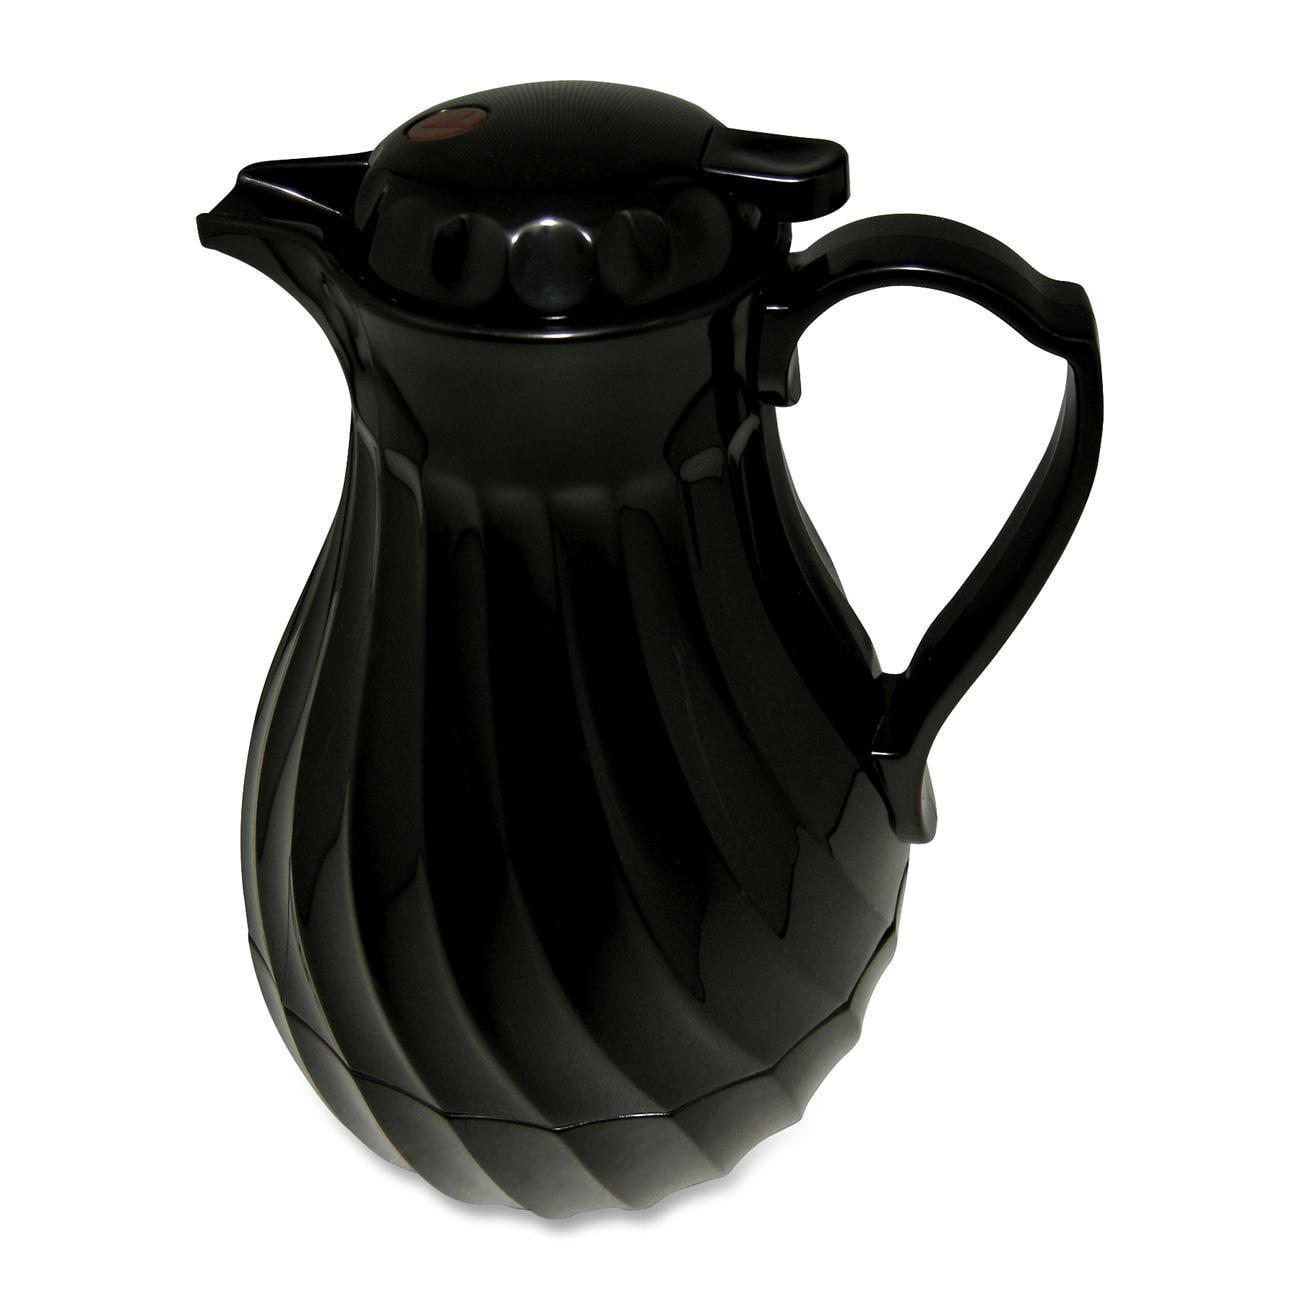 Hormel, HOR4022B, Black Swirl Insulated Plastic Carafe, 1 Each, Black